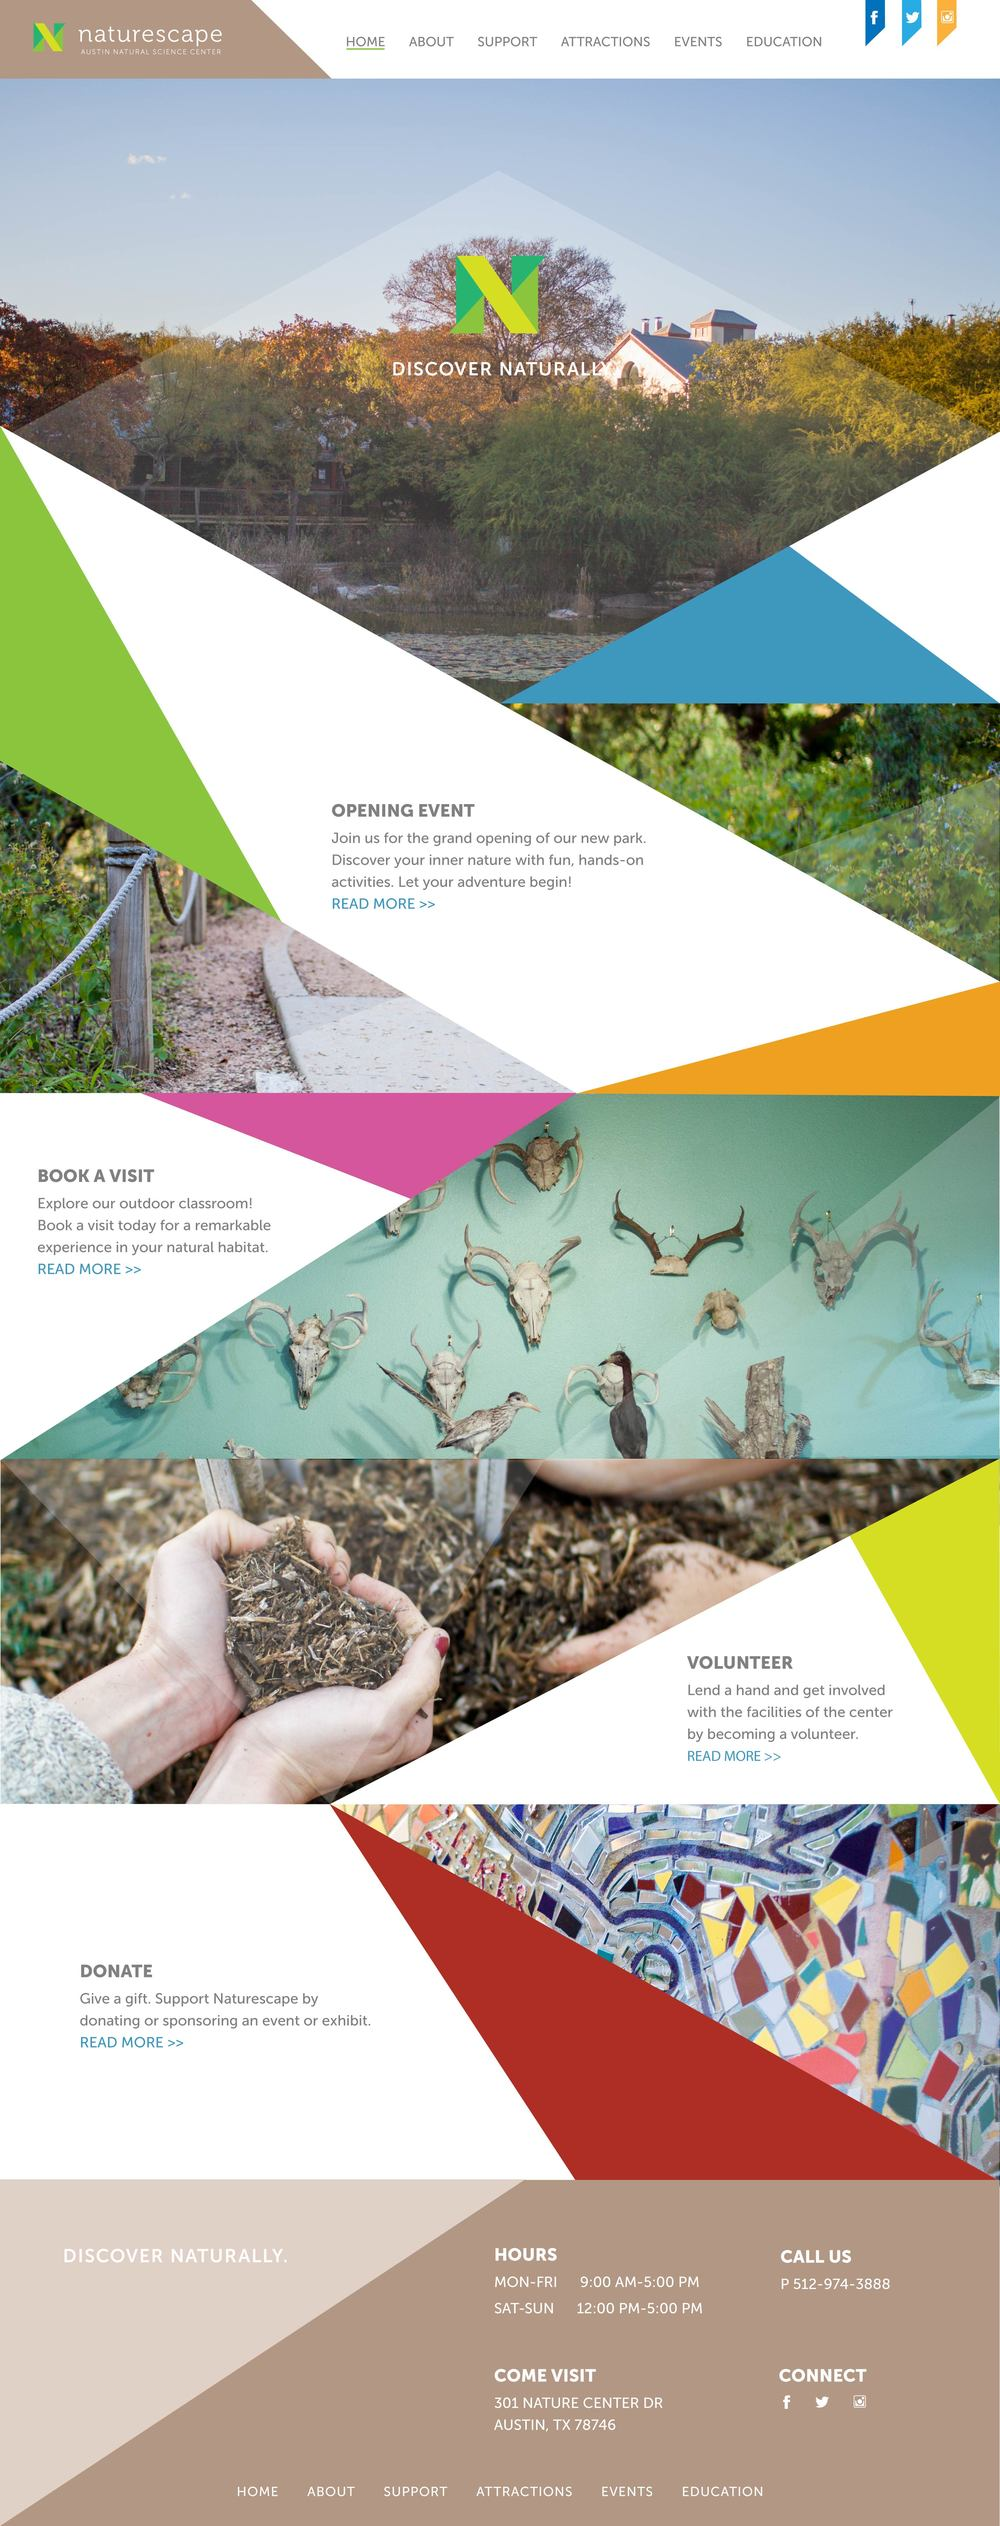 Naturescape Website_Home Pg.jpg